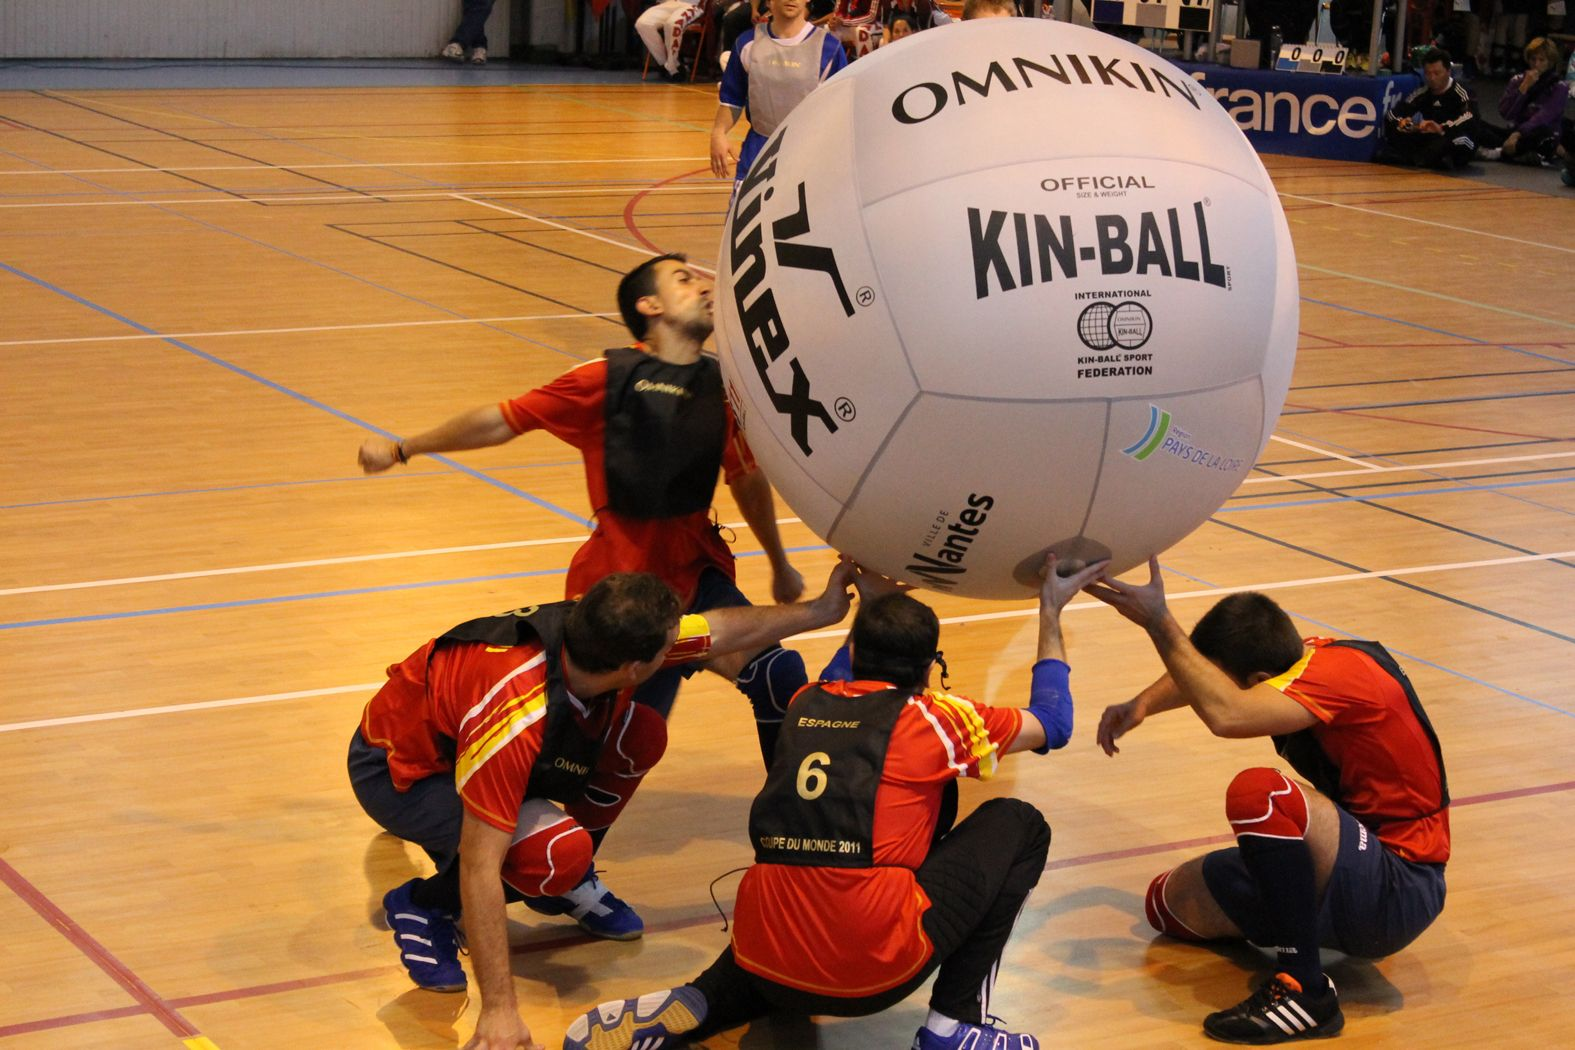 El Kinball